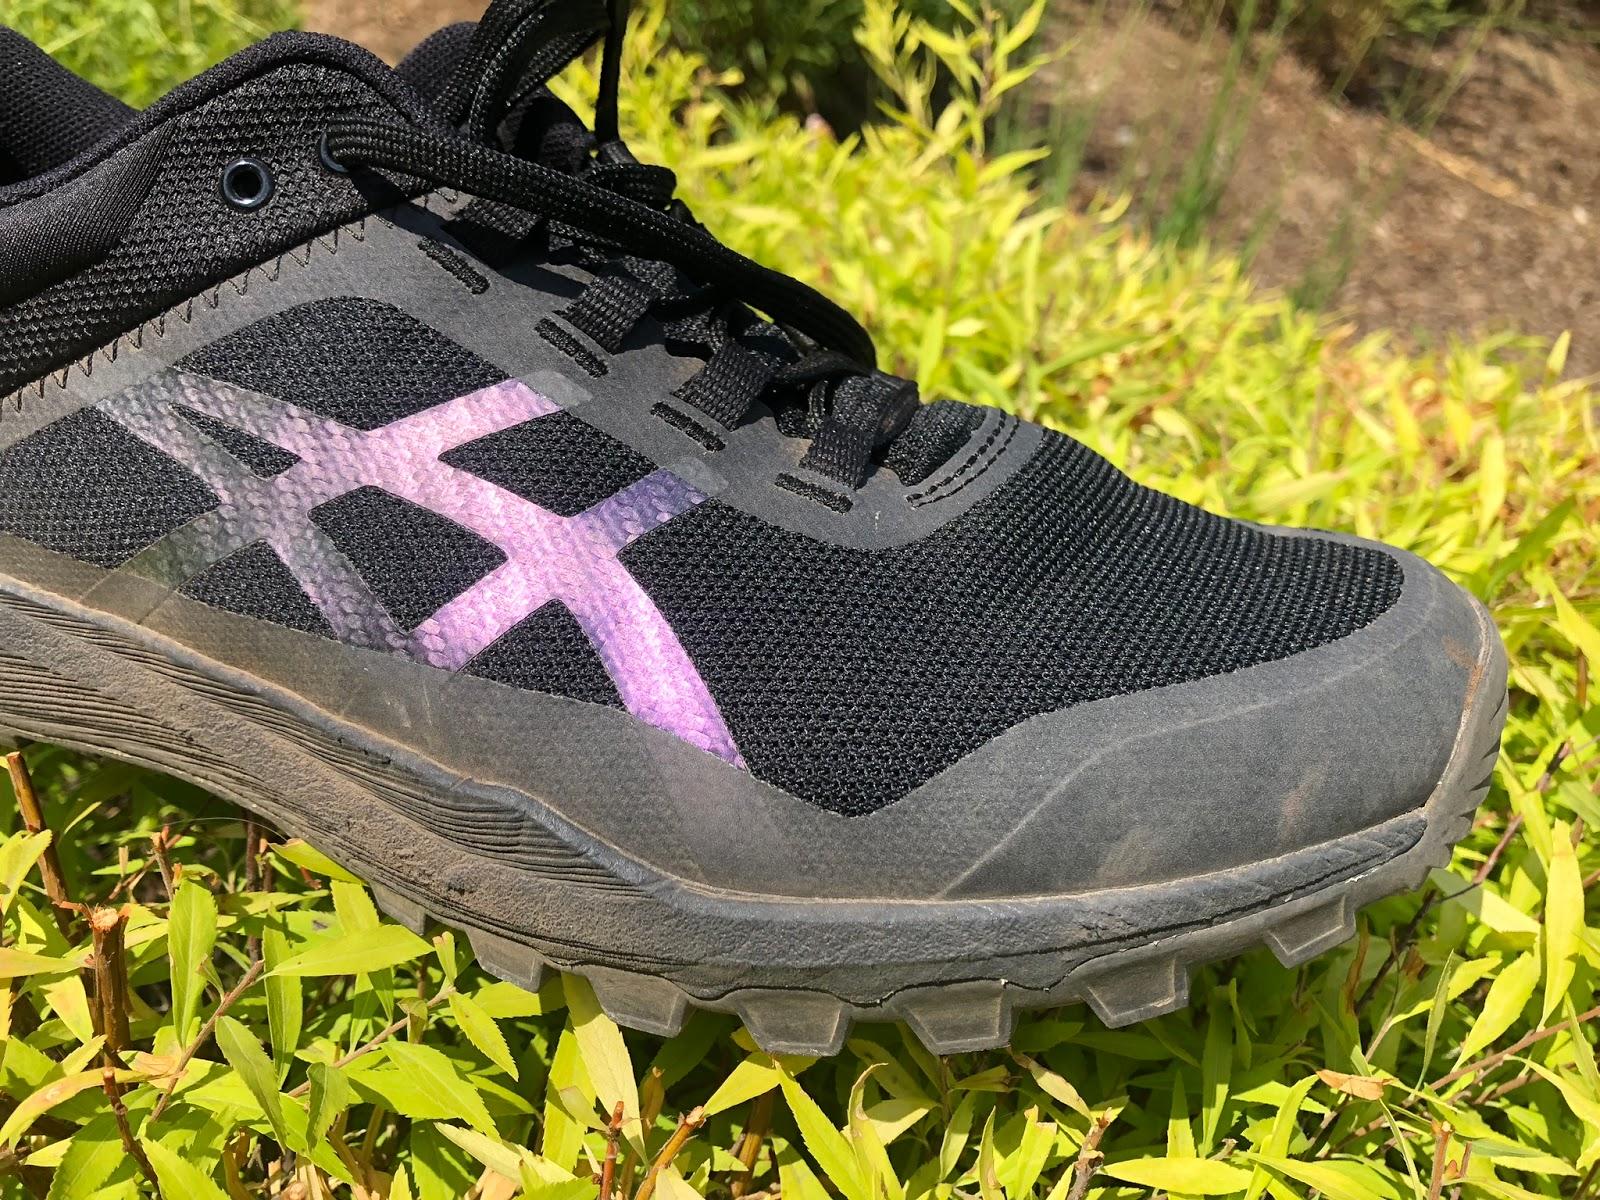 brand new 22494 896c6 Road Trail Run: Asics Gecko XT Review - Rock Crawler ...